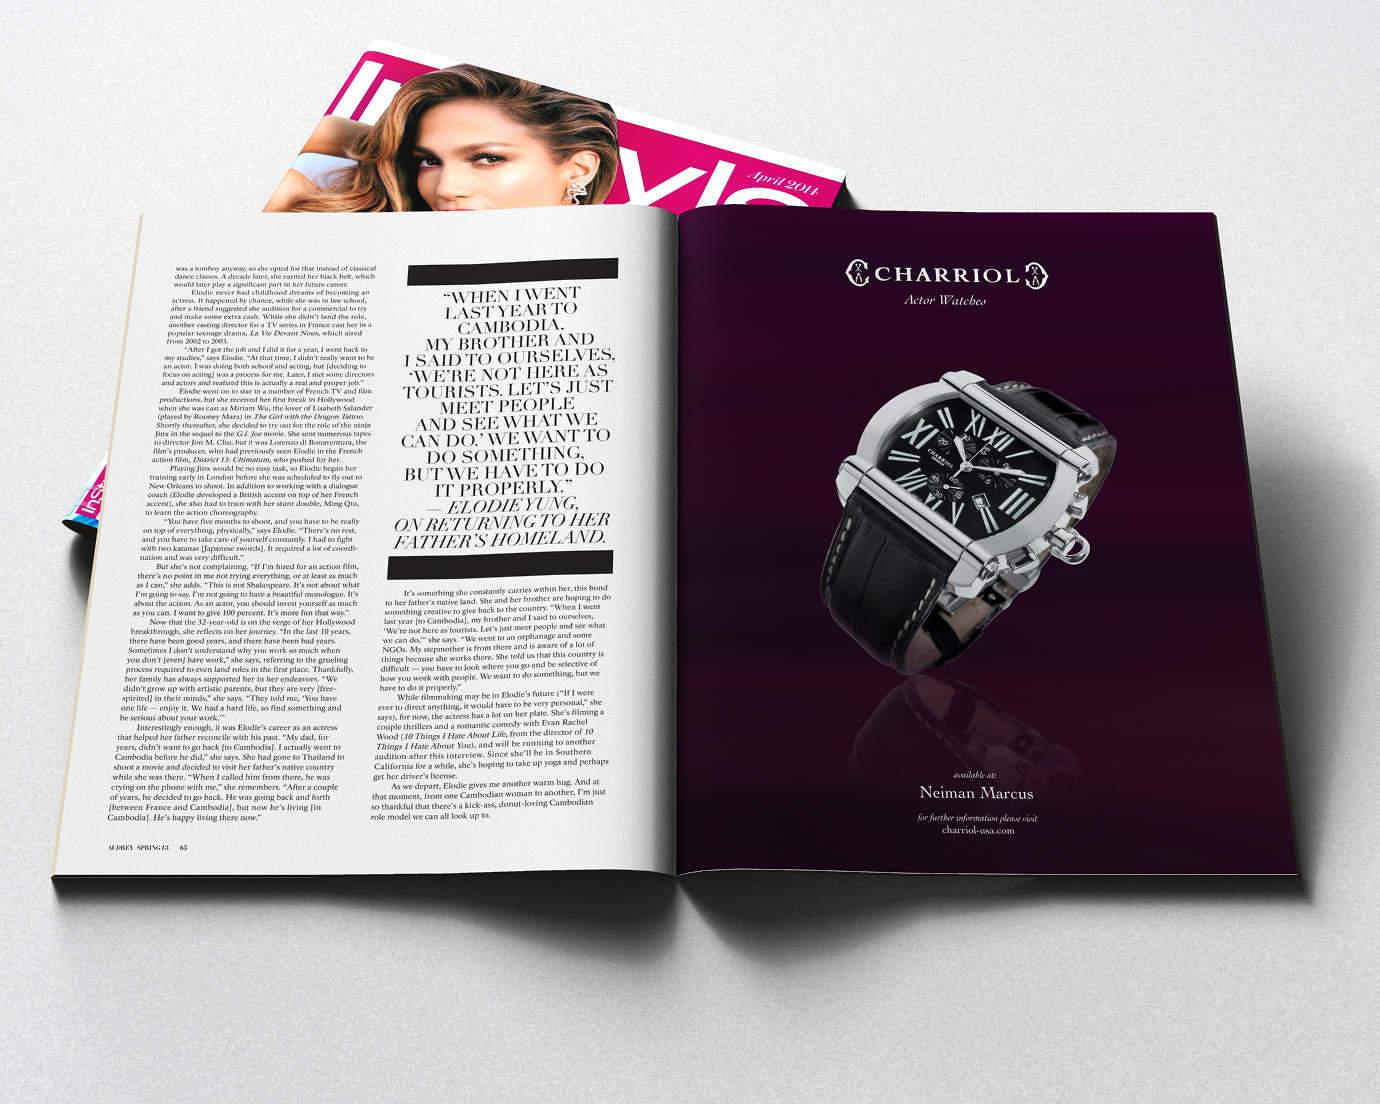 magazine-ad-layout-design-concept-still